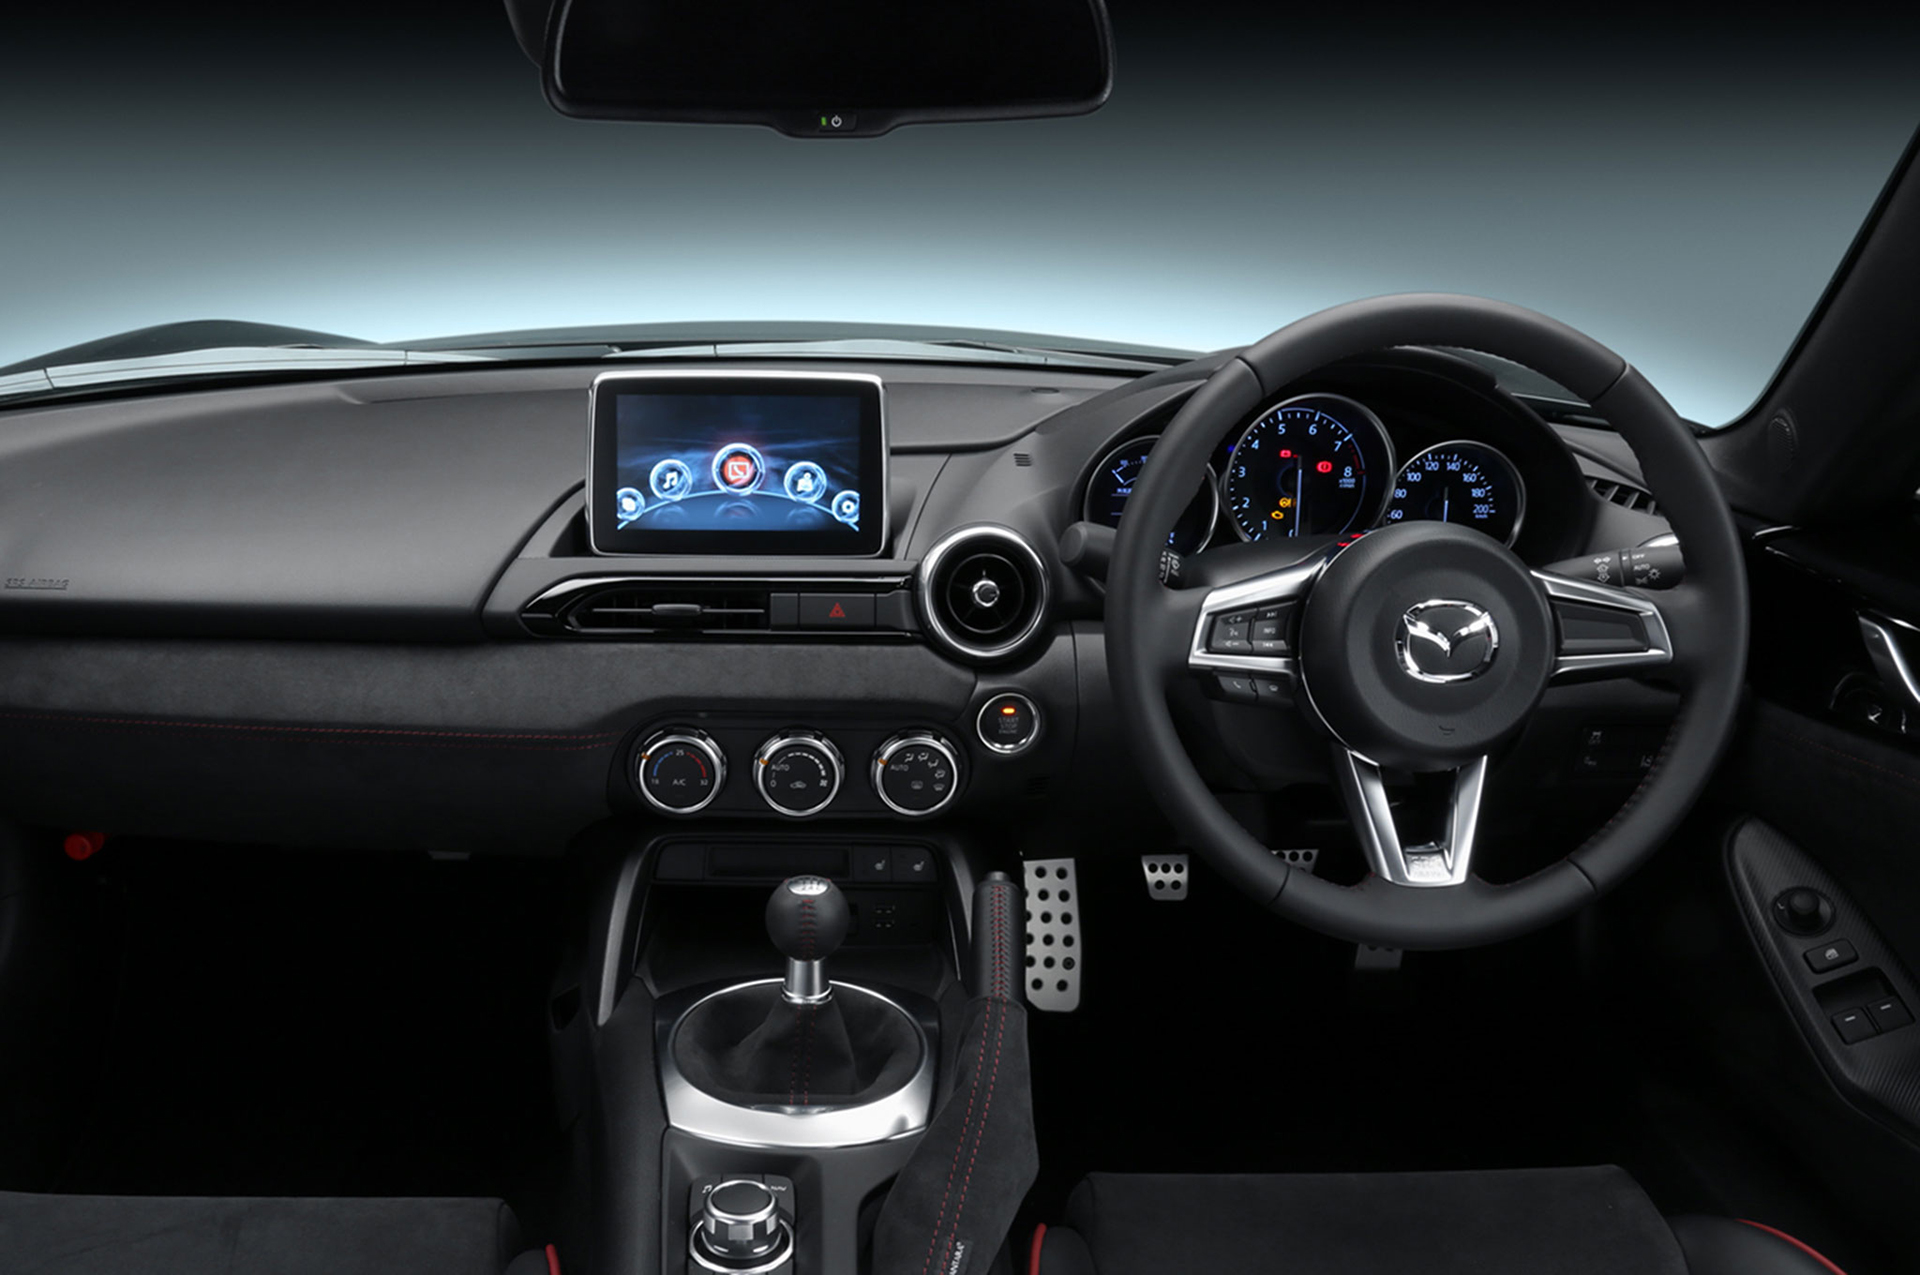 Mazda MX-5 Racing Concept - Tokyo Auto Salon 2016 - volant / racing wheel